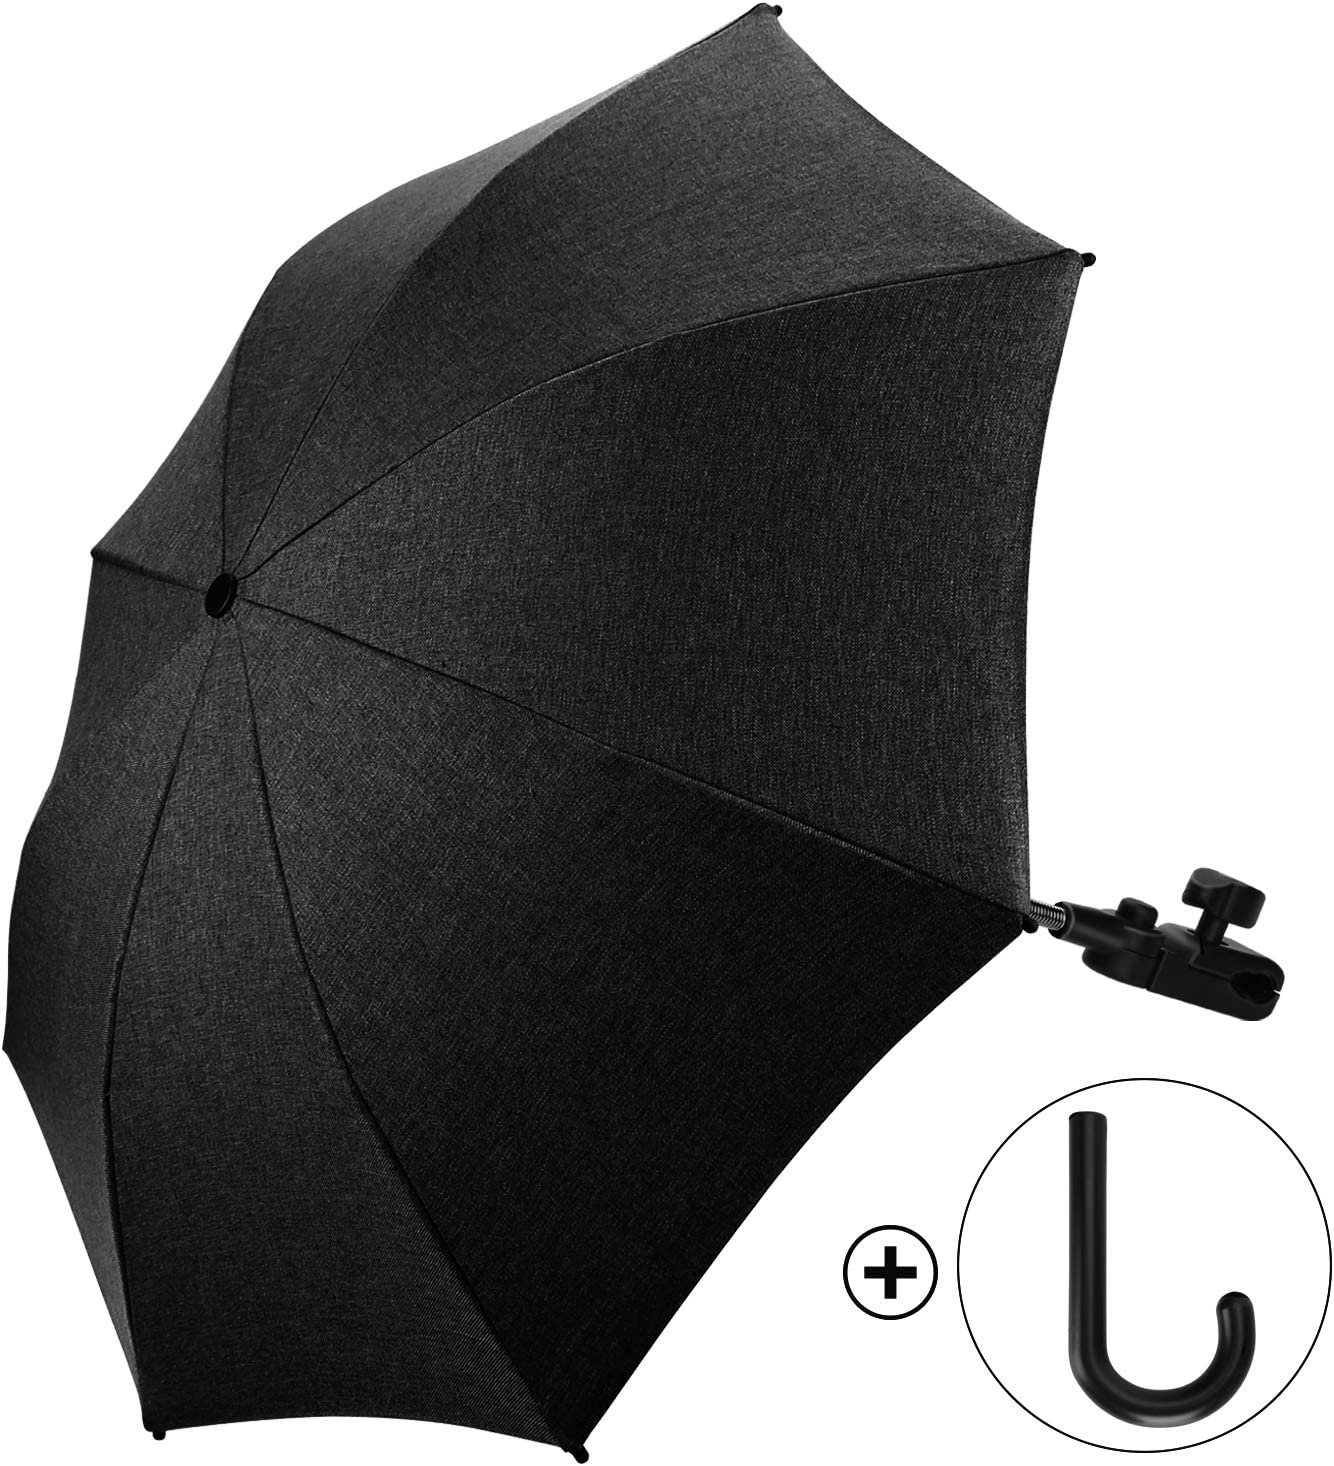 Negro Sombrilla Carrito Bebe Universal Paraguas Carrito Bebe Di/ámetro 73cm Anti Rayos UV 50 con Un Mango de Paraguas